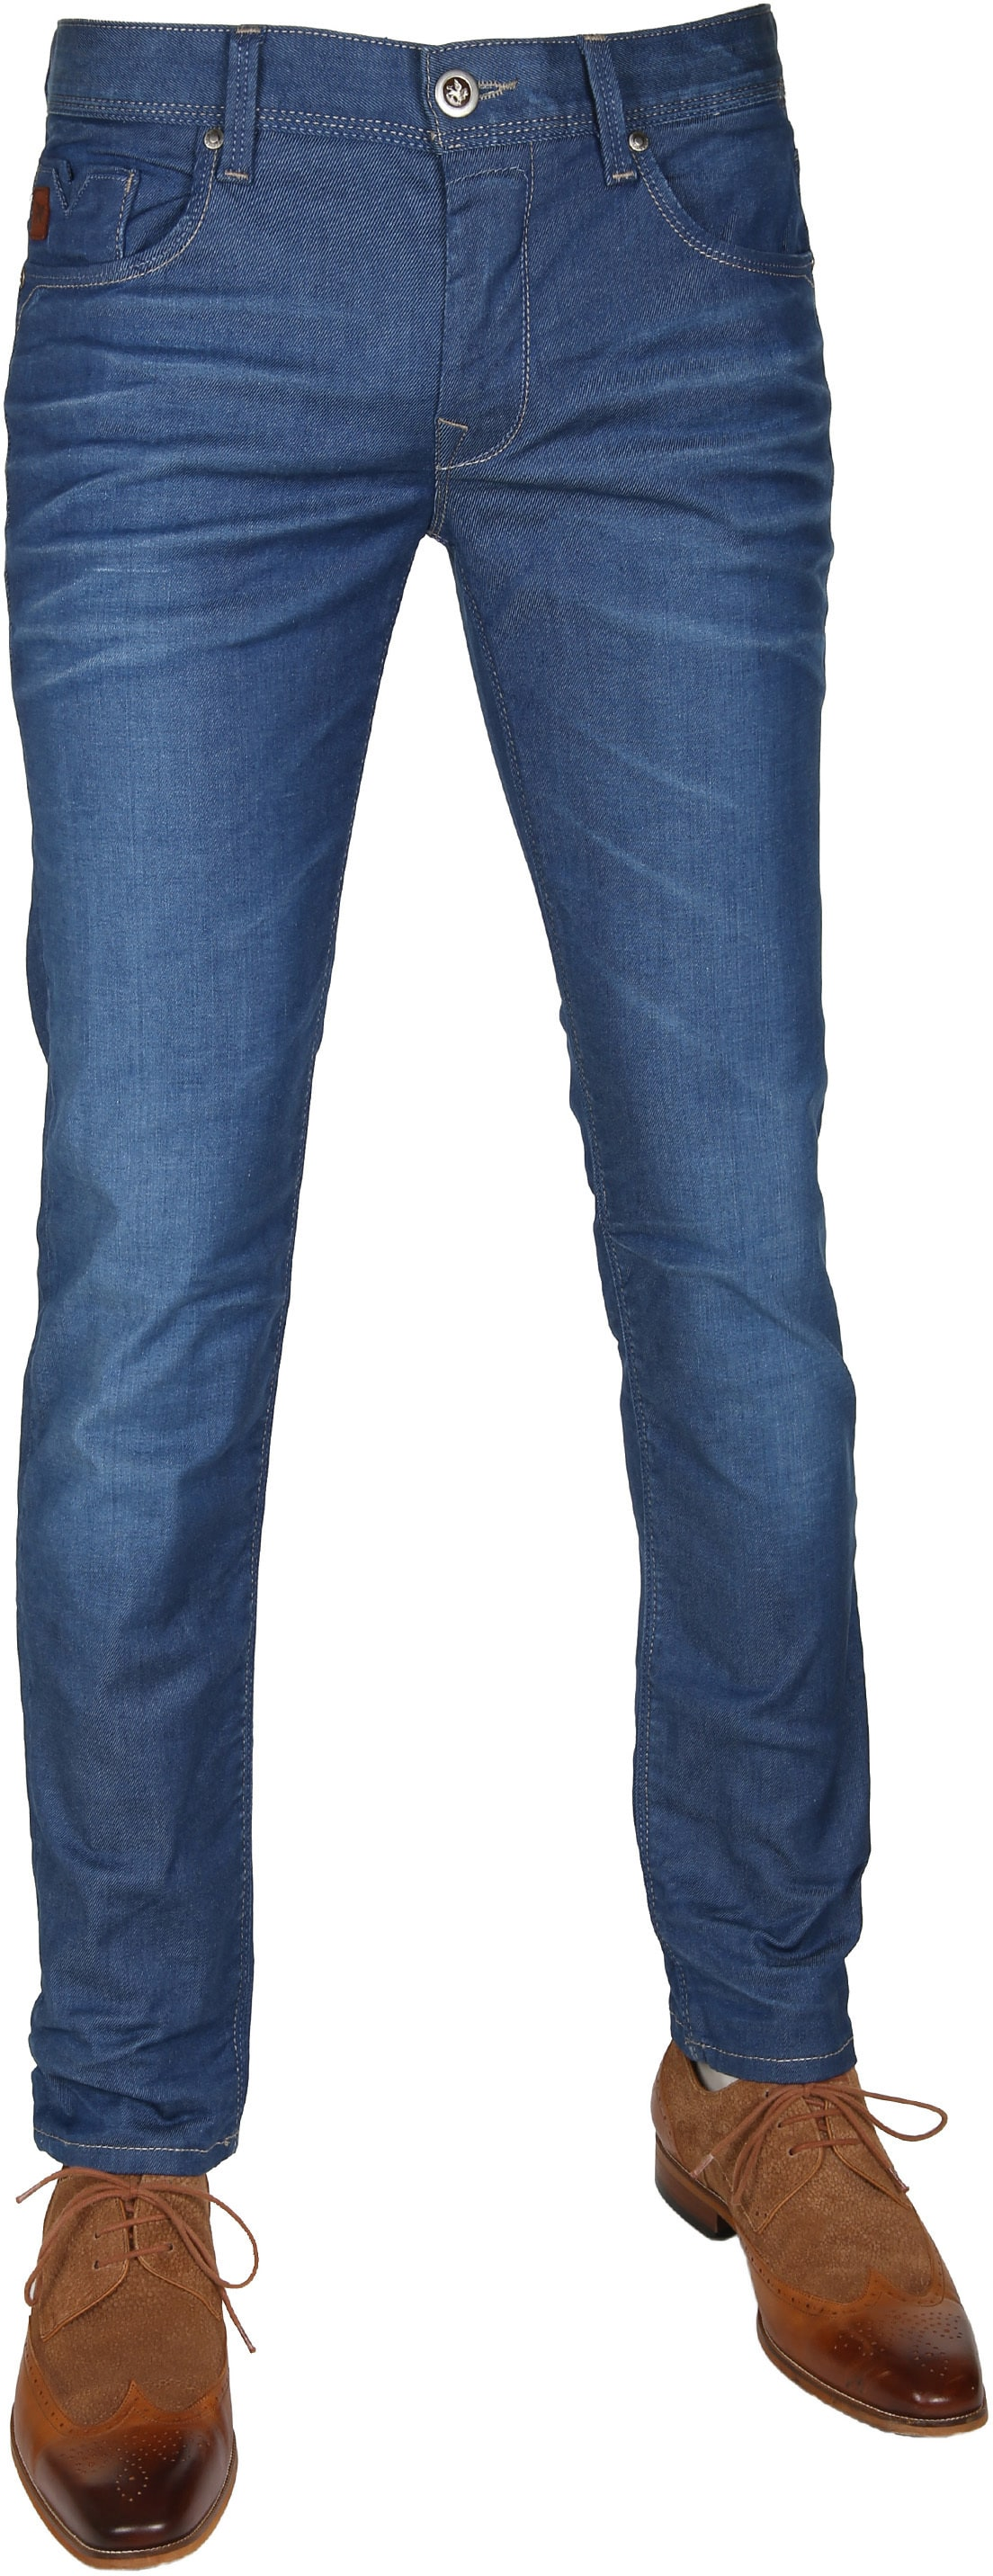 Vanguard V7 Rider Jeans foto 0